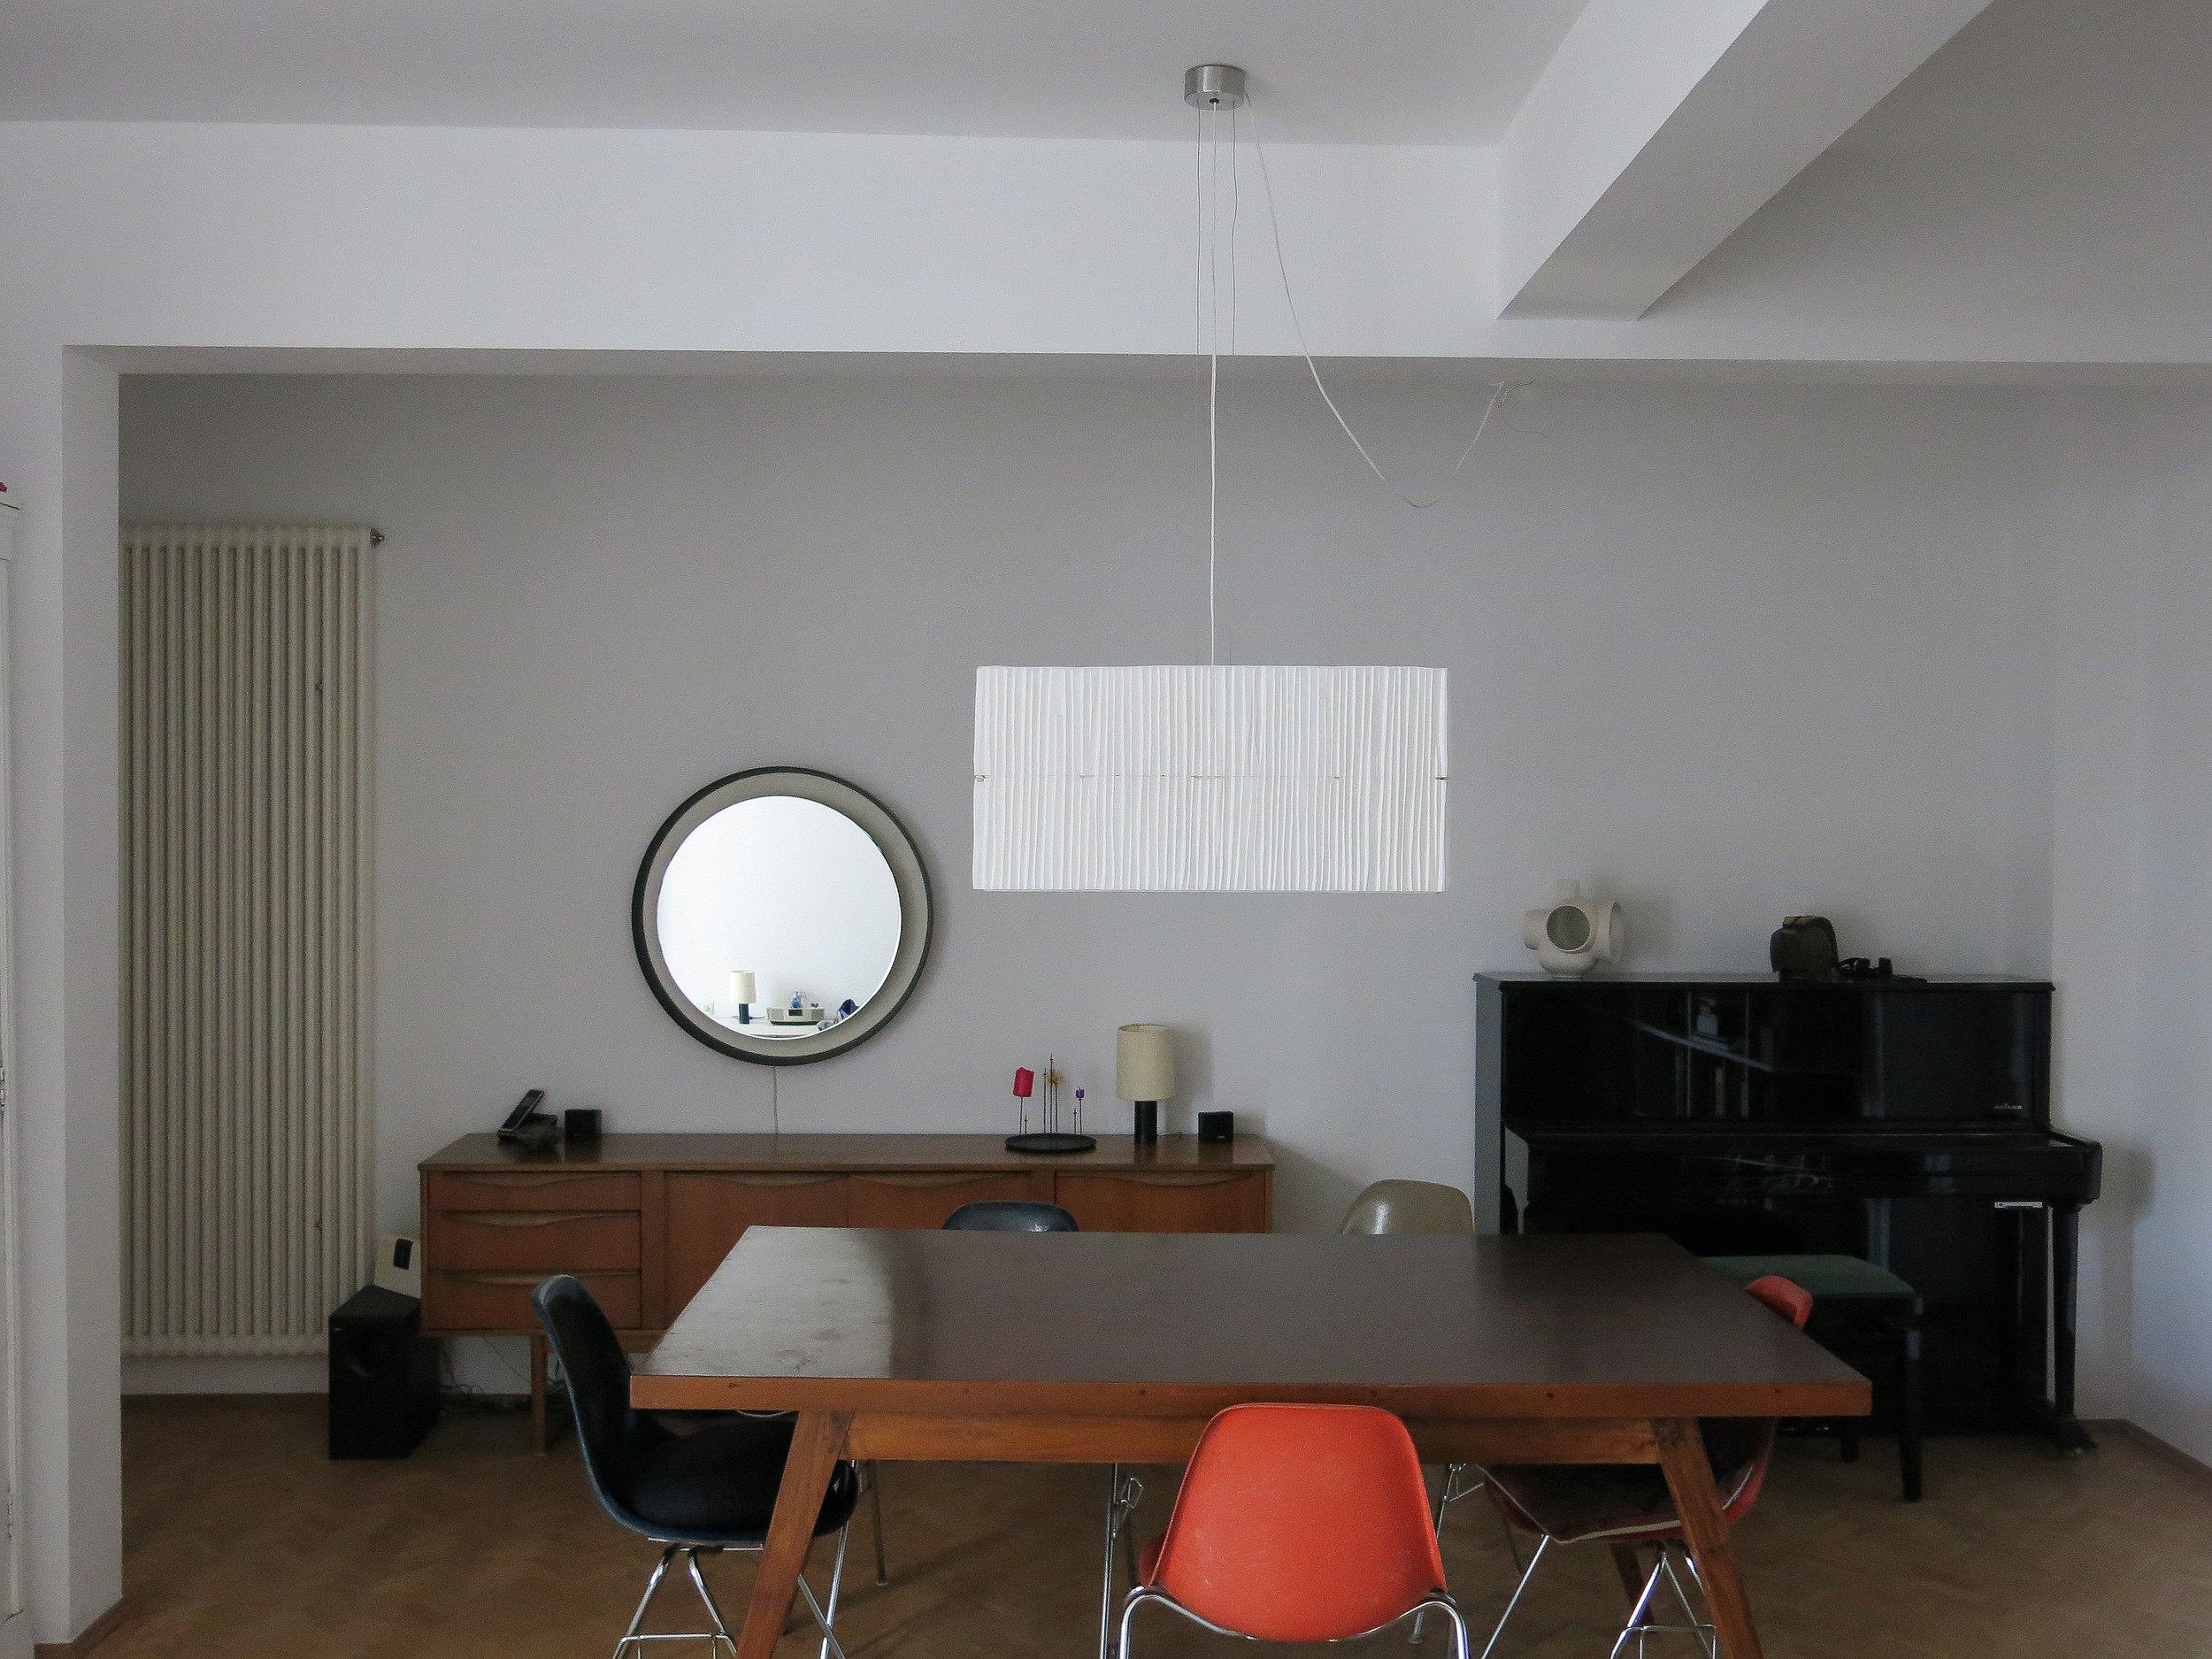 2-floor lamp in situ